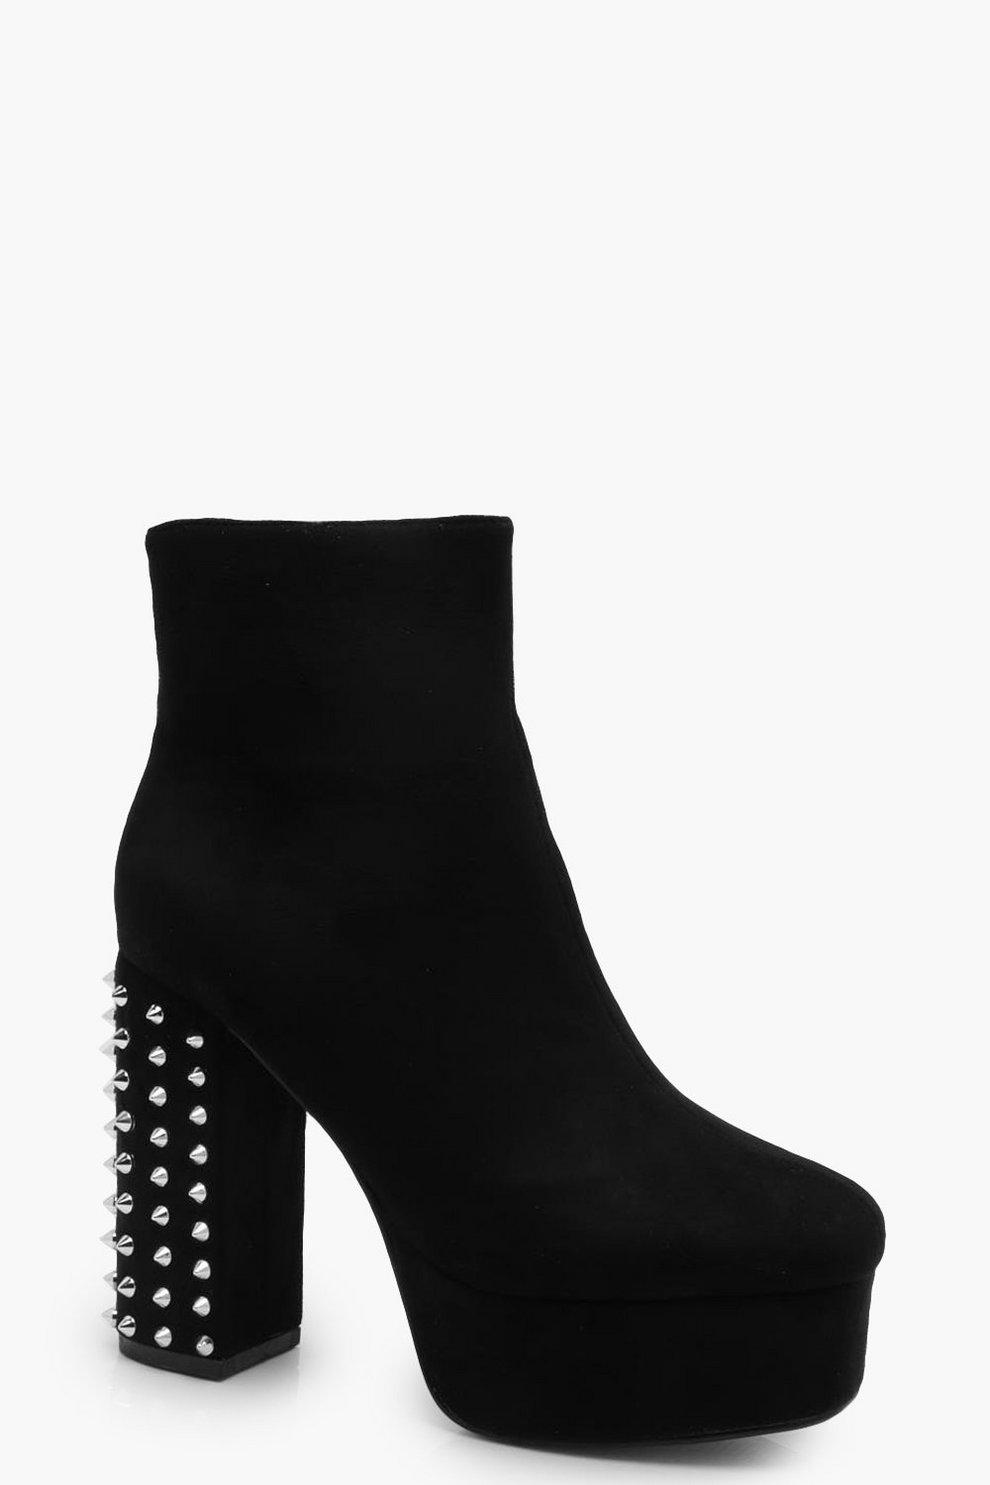 a4df2ee44d Studded Block Heel Platform Boots | Boohoo